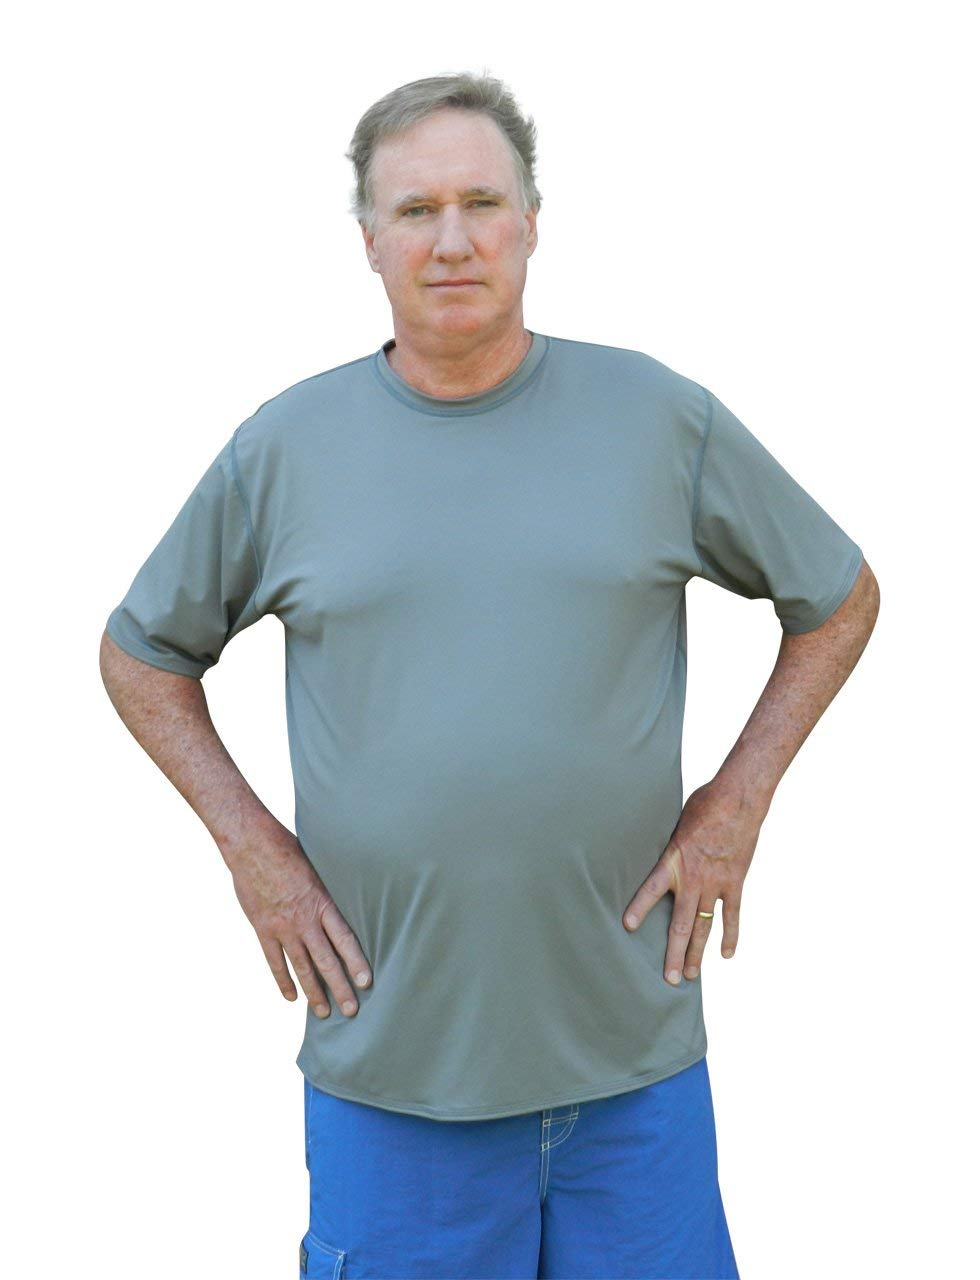 882736cef78c0 Get Quotations · Plus Size Rash Guard Swim Shirt - UV Sun Protection -  Chlorine Proof